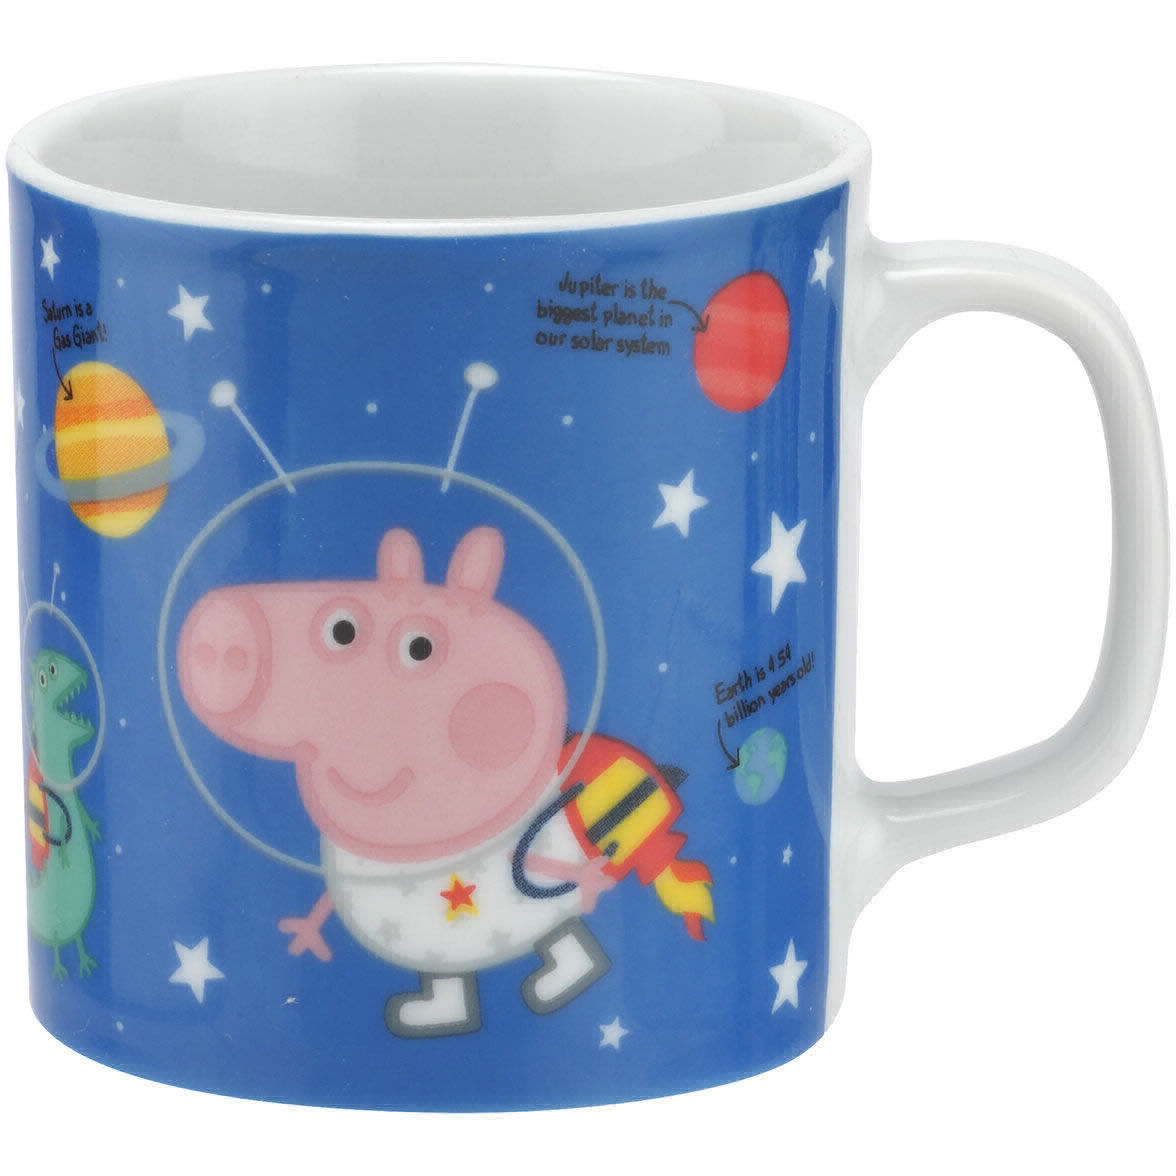 Portmeirion Peppa Pig Mug Astronaut George  sc 1 st  Louis Potts & Portmeirion Peppa Pig Mug Astronaut George | Louis Potts